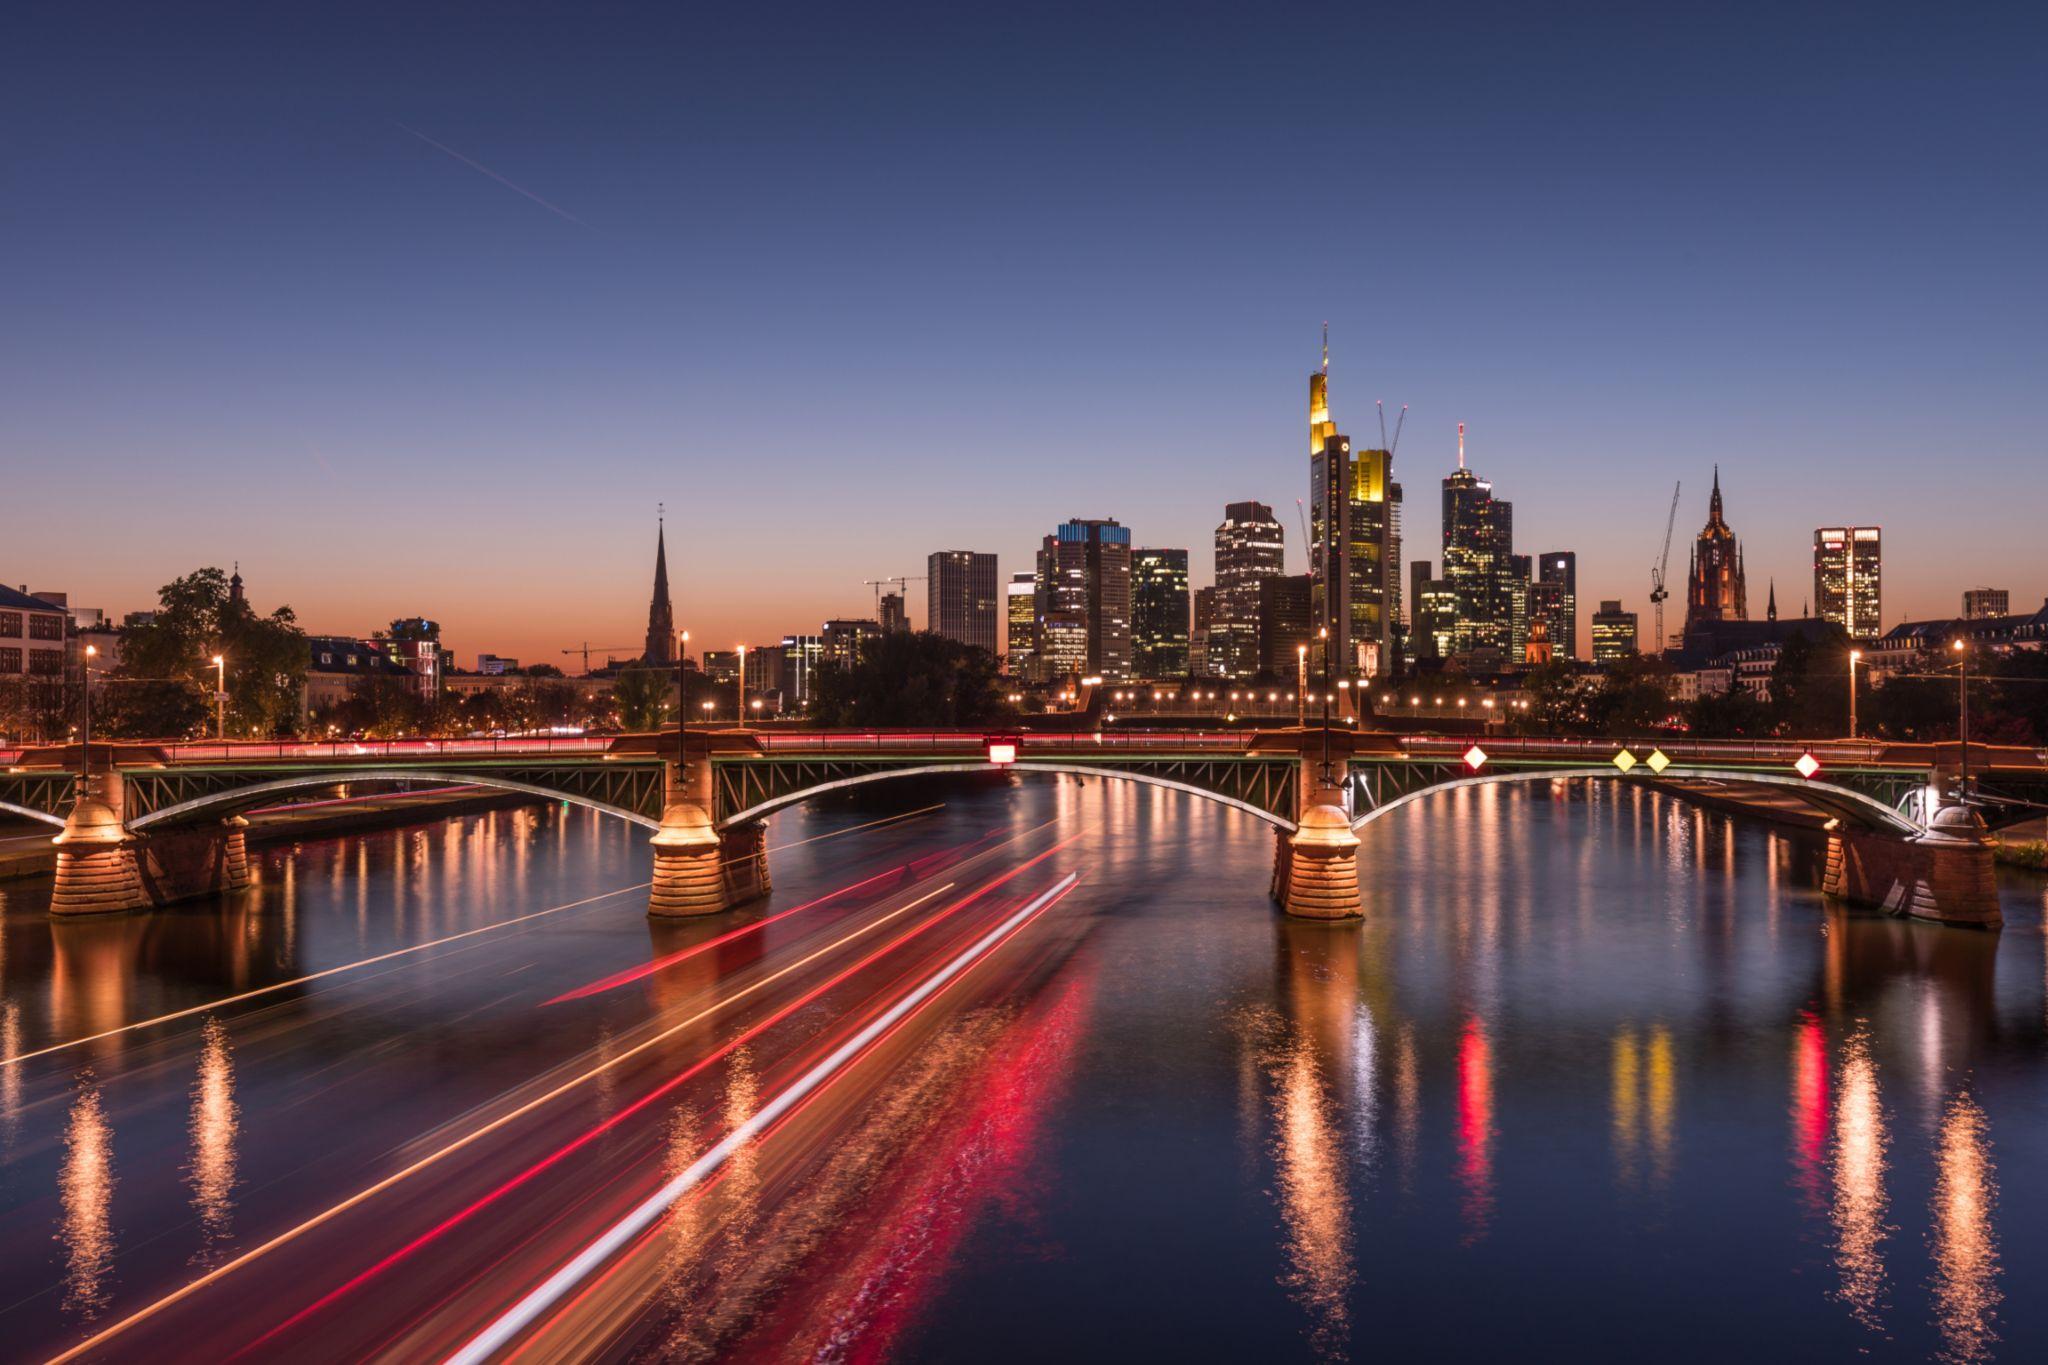 Skyline in Frankfurt am Main, Germany